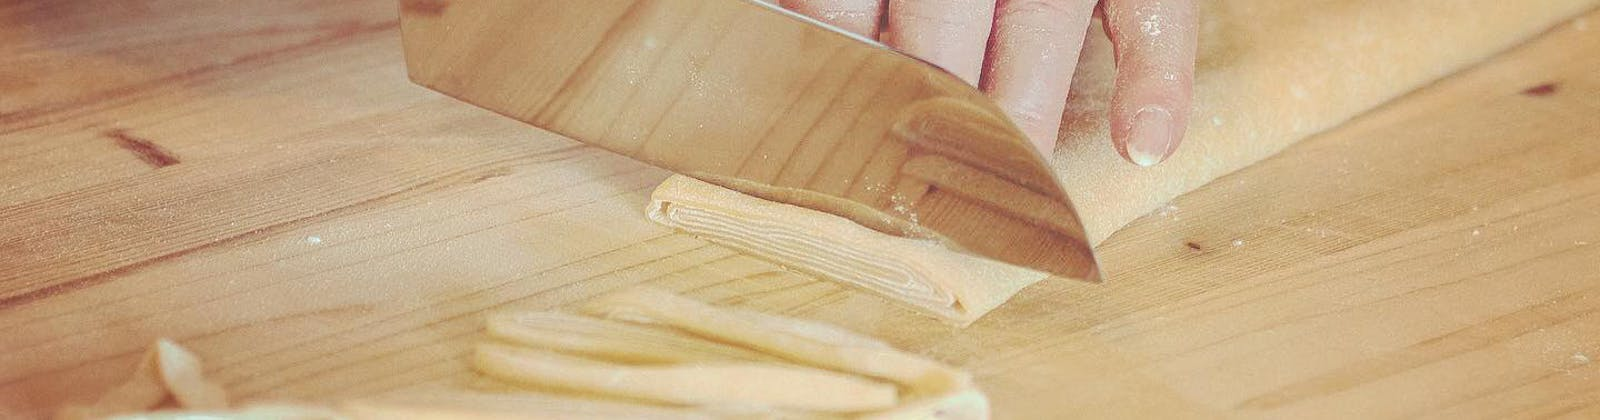 Nonna Nerina cutting gluten free pasta